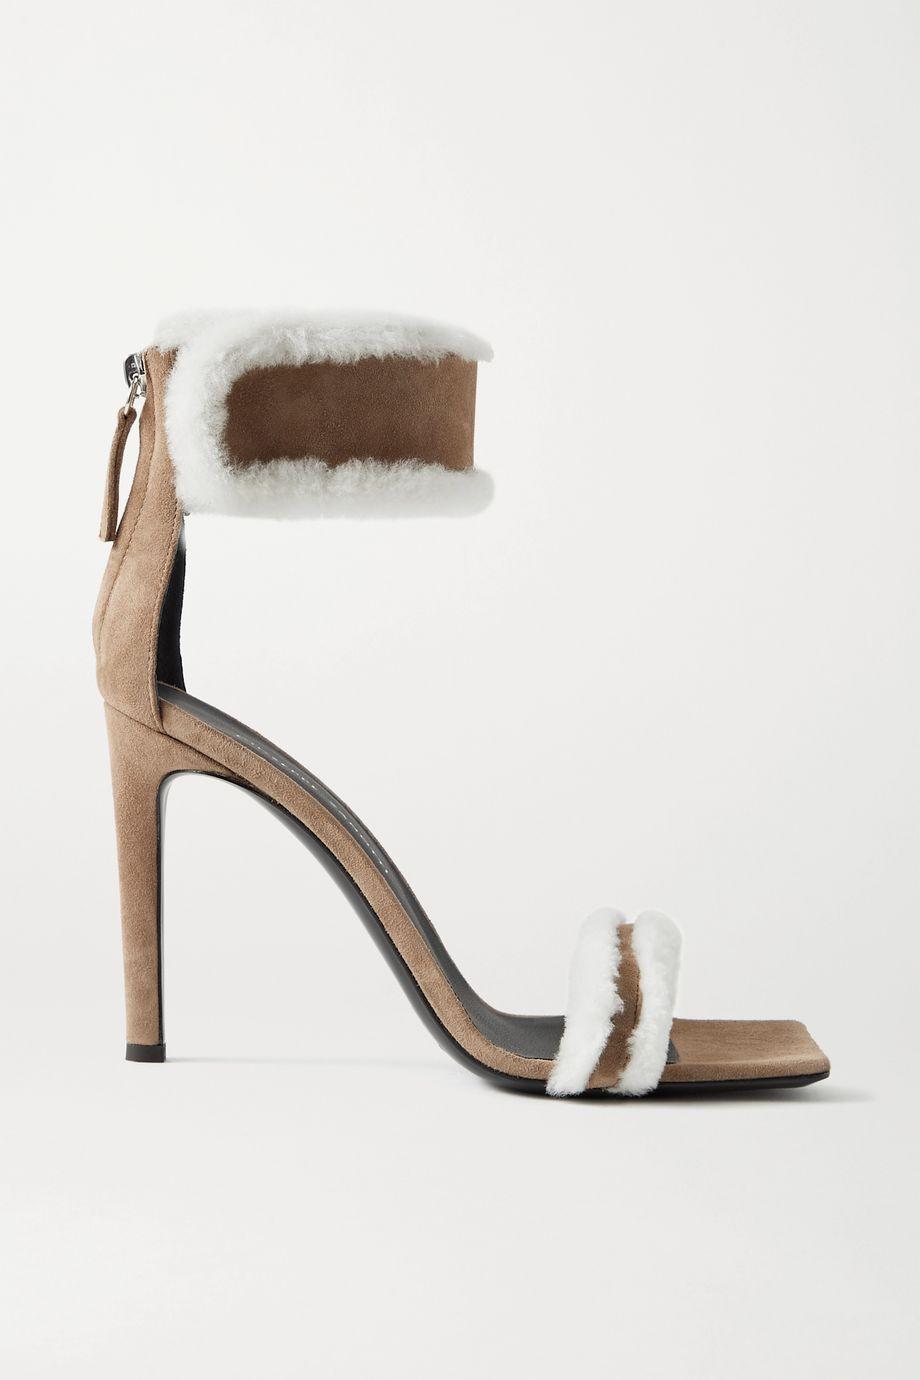 Giuseppe Zanotti Kanda shearling-trimmed suede sandals